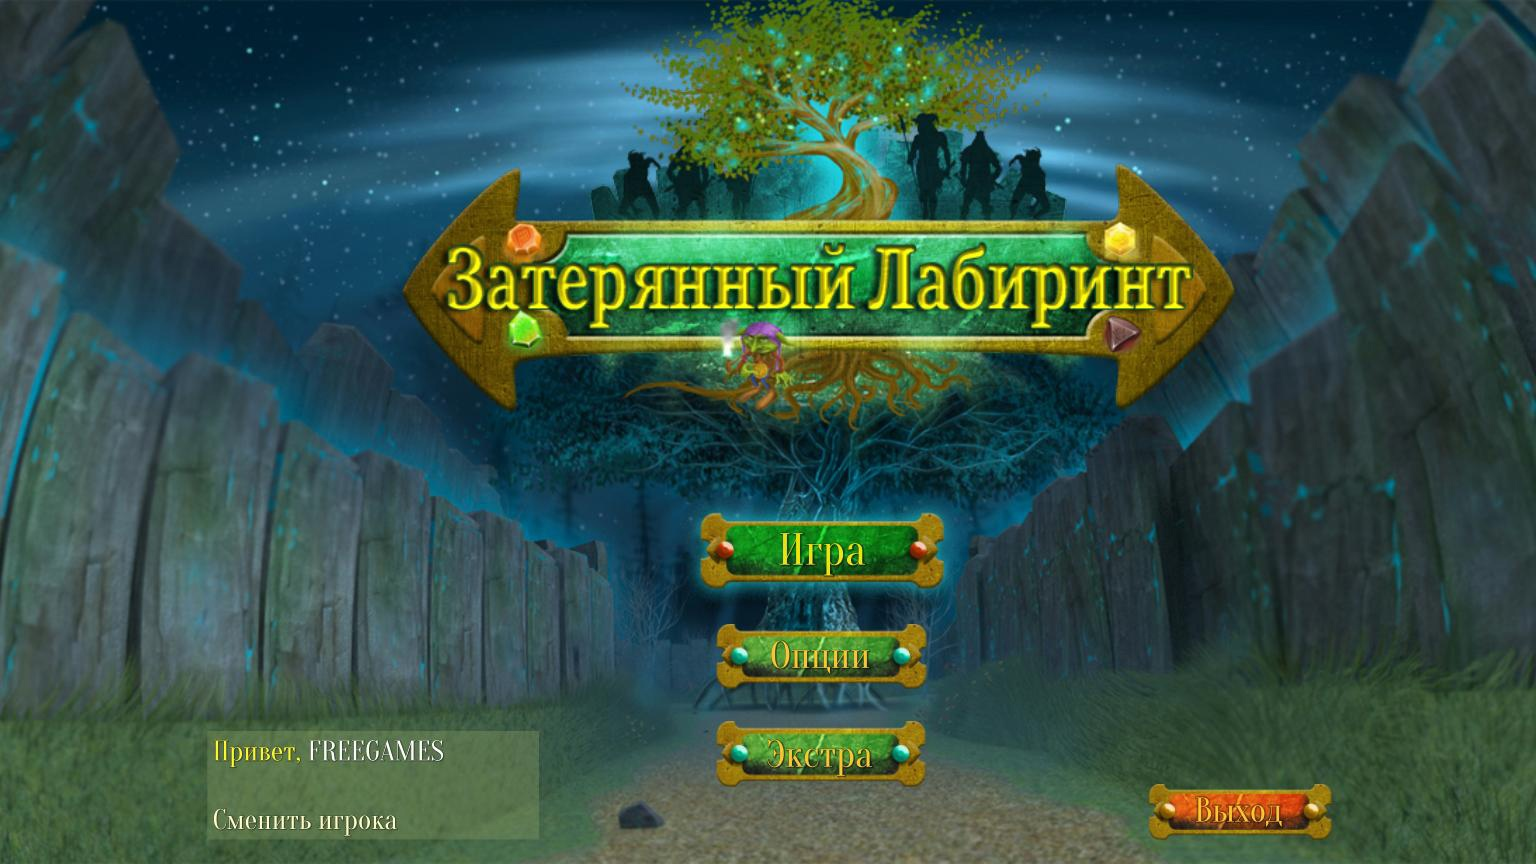 Затерянный лабиринт | The Lost Labyrinth (Rus)